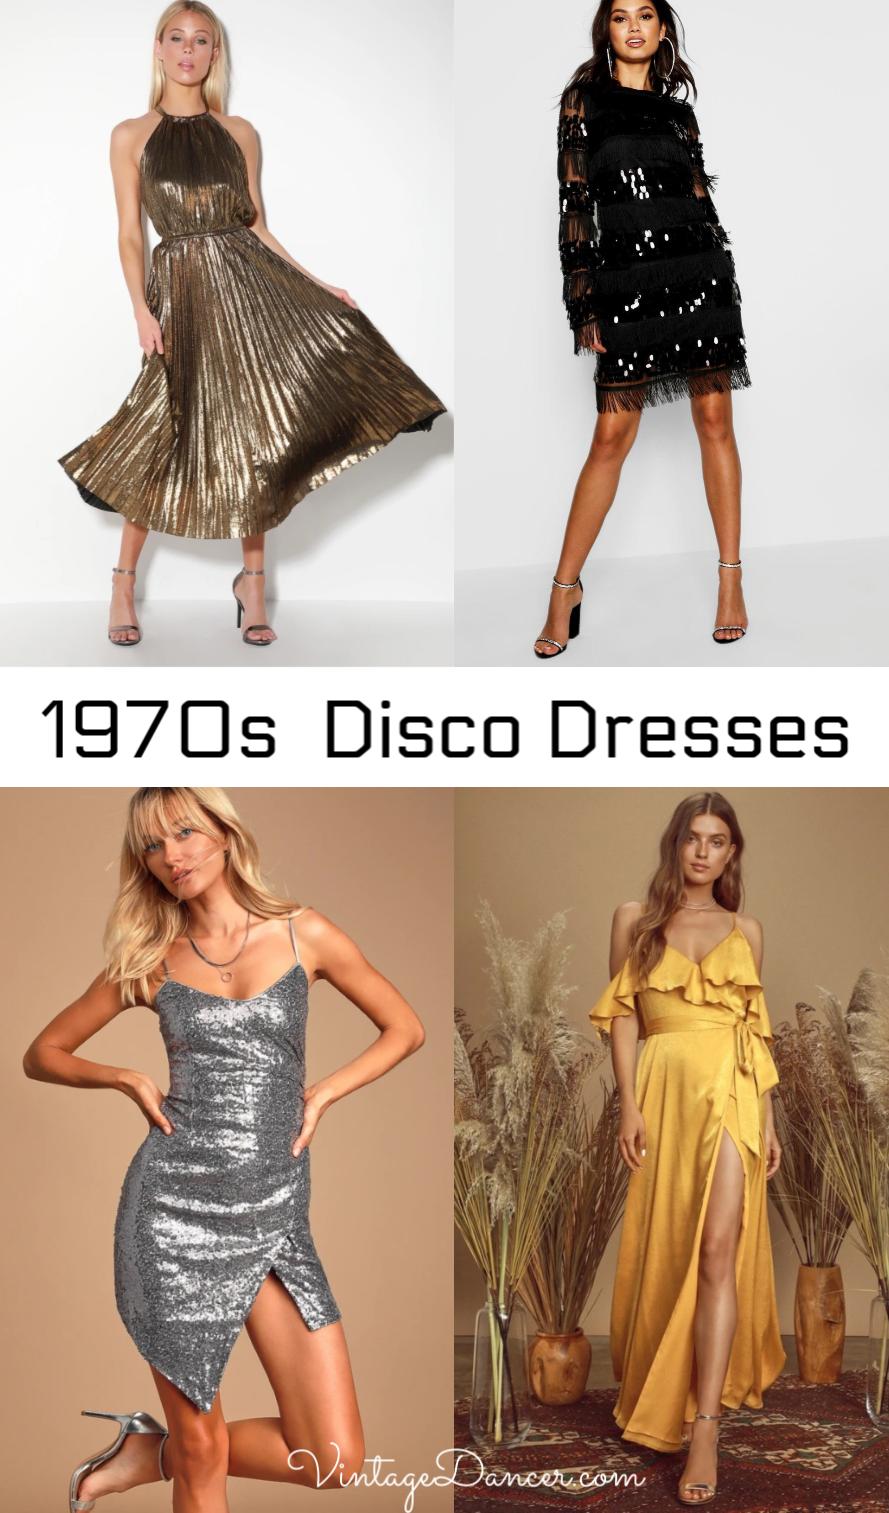 70s Disco Dresses 1970s Disco Dress At Vintagedancer Com Short Long Wrap Gold Silver Sequins Black Red And Mo Disco Dress 70s Disco Dress Disco Fashion [ 1513 x 889 Pixel ]